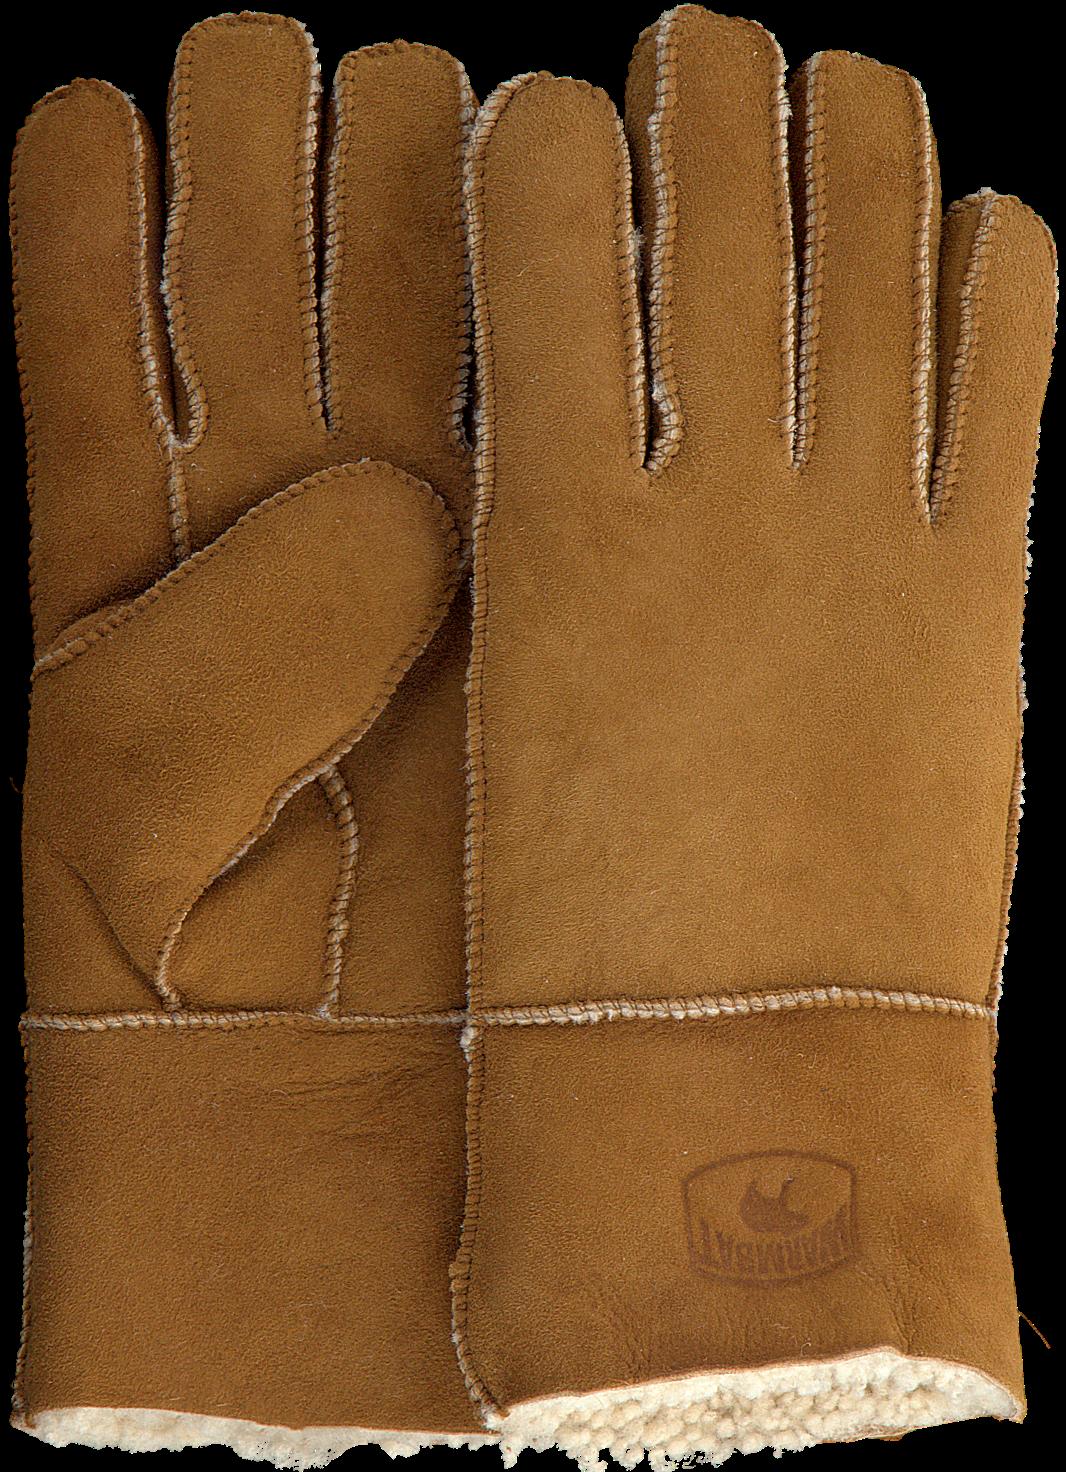 Cognacfarbene WARMBAT Handschuhe GLOVES WOMEN TeGGK